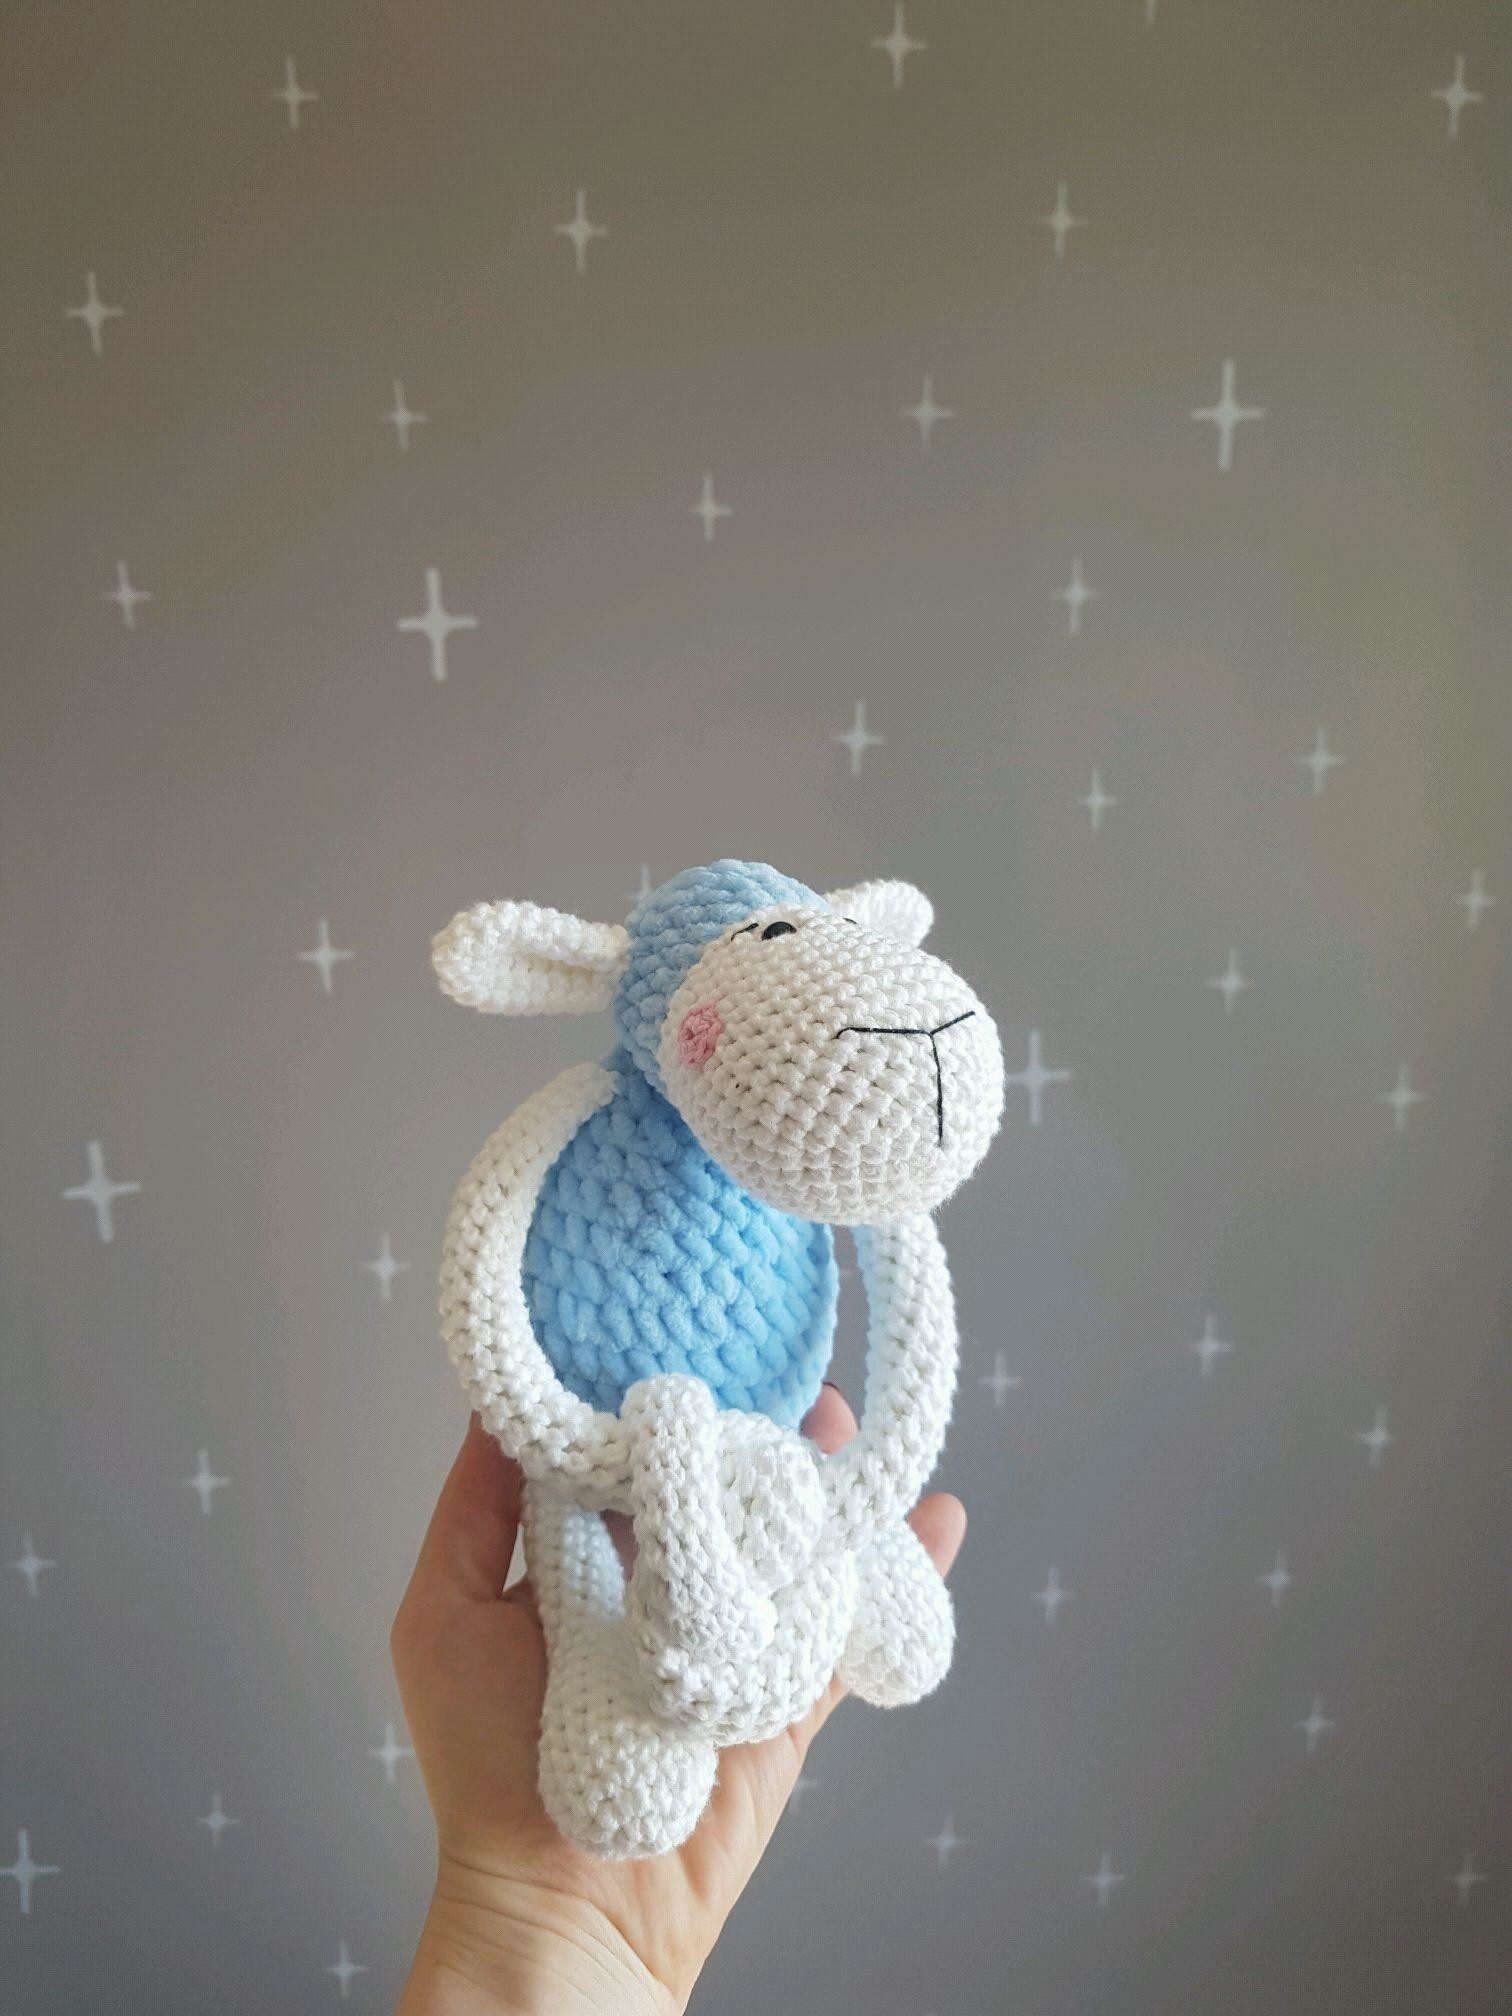 Amigurumi sheep plush toy pattern | Moutons en crochet, Modèles de ... | 2016x1512